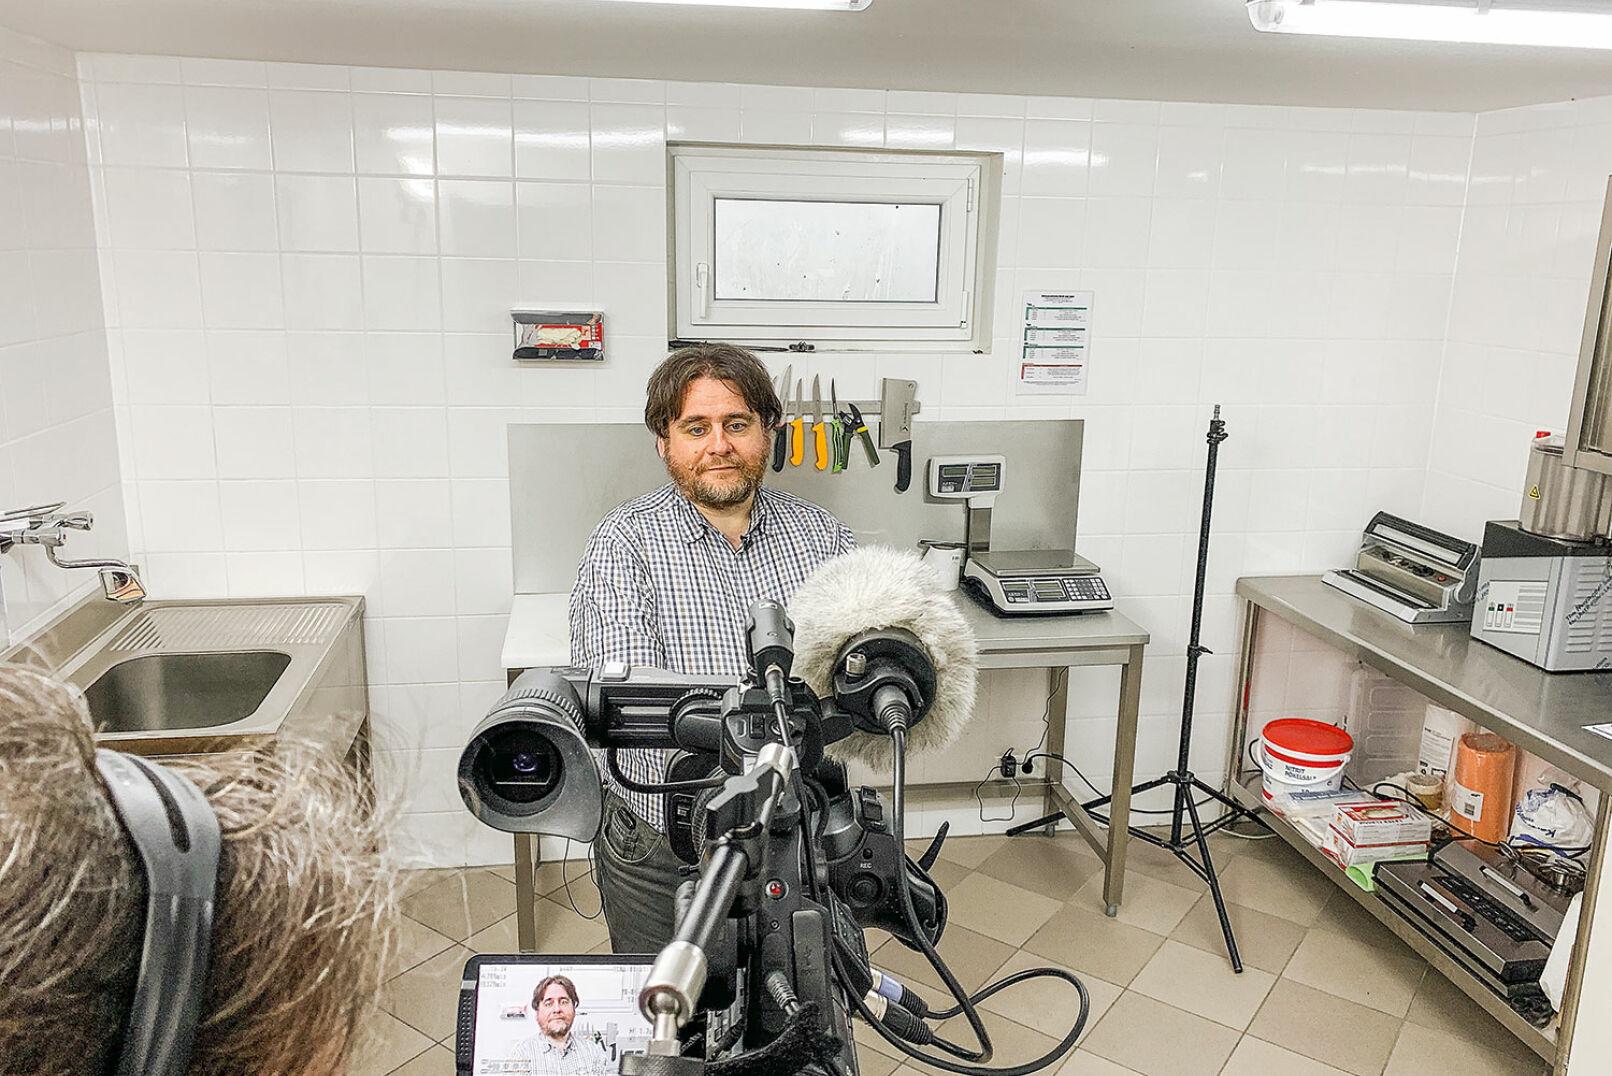 Ao. Univ.-Prof. Dr. Peter Paulsen vom Institut für Lebensmittelsicherheit der Vet.-Med. Univ. Wien